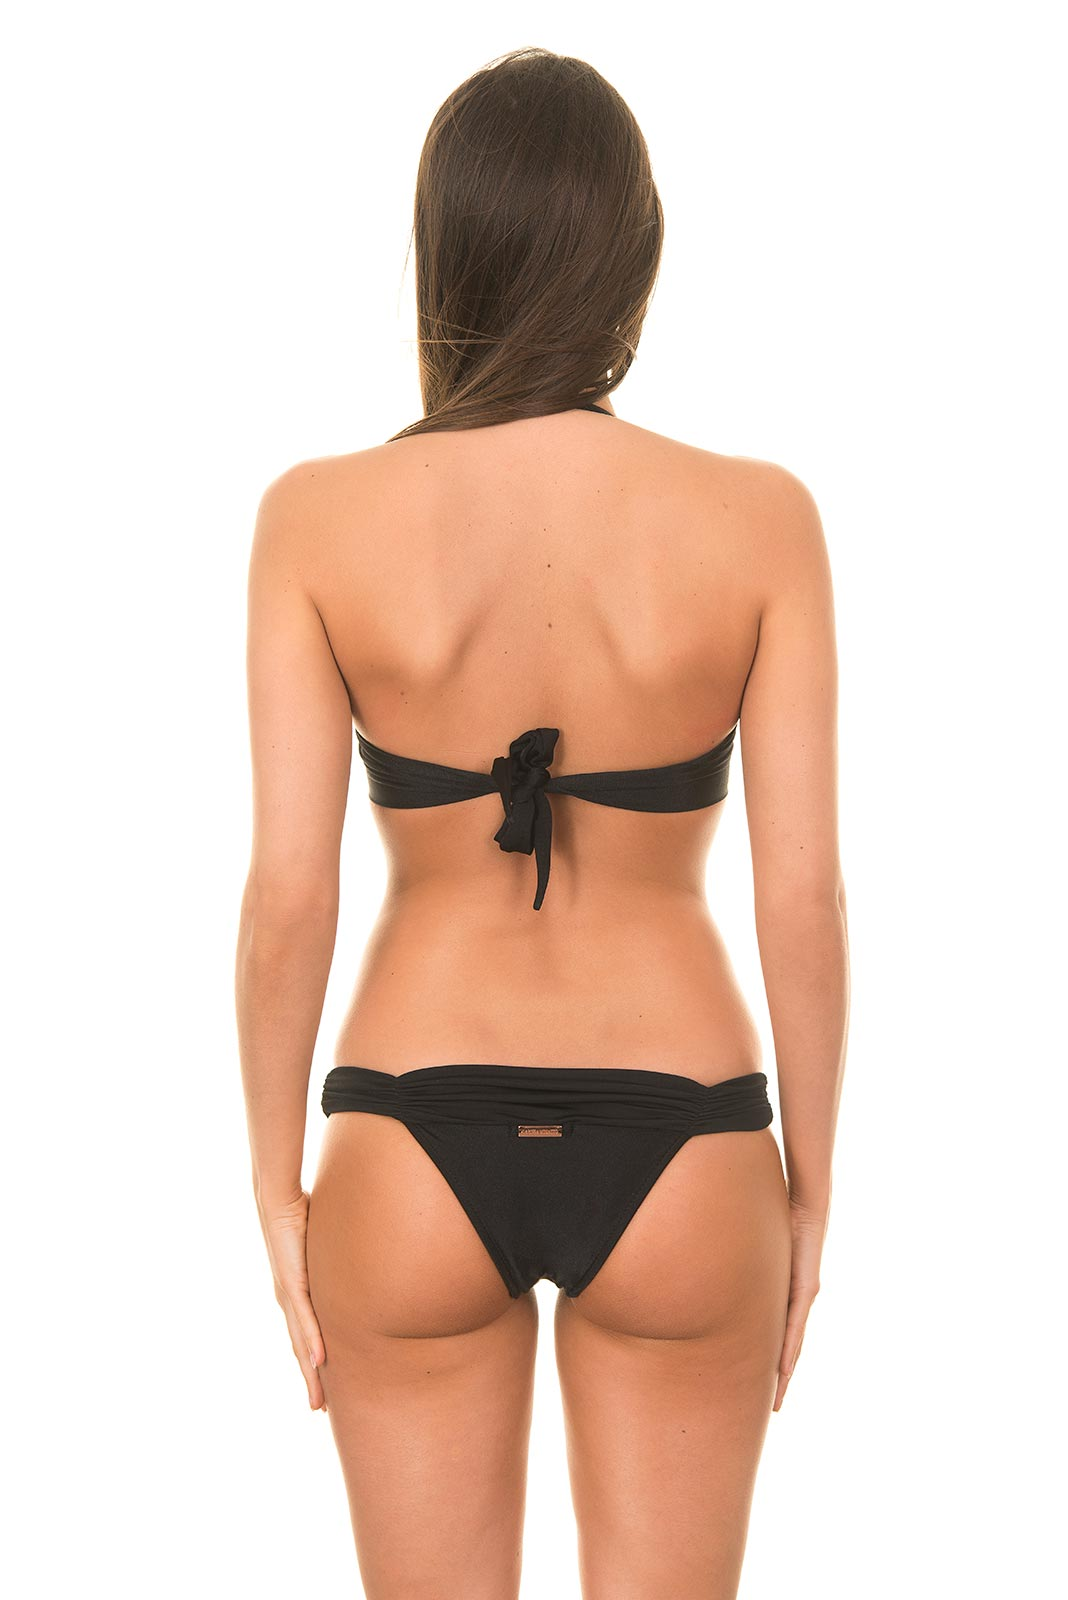 Black Bandeau Bikini 22